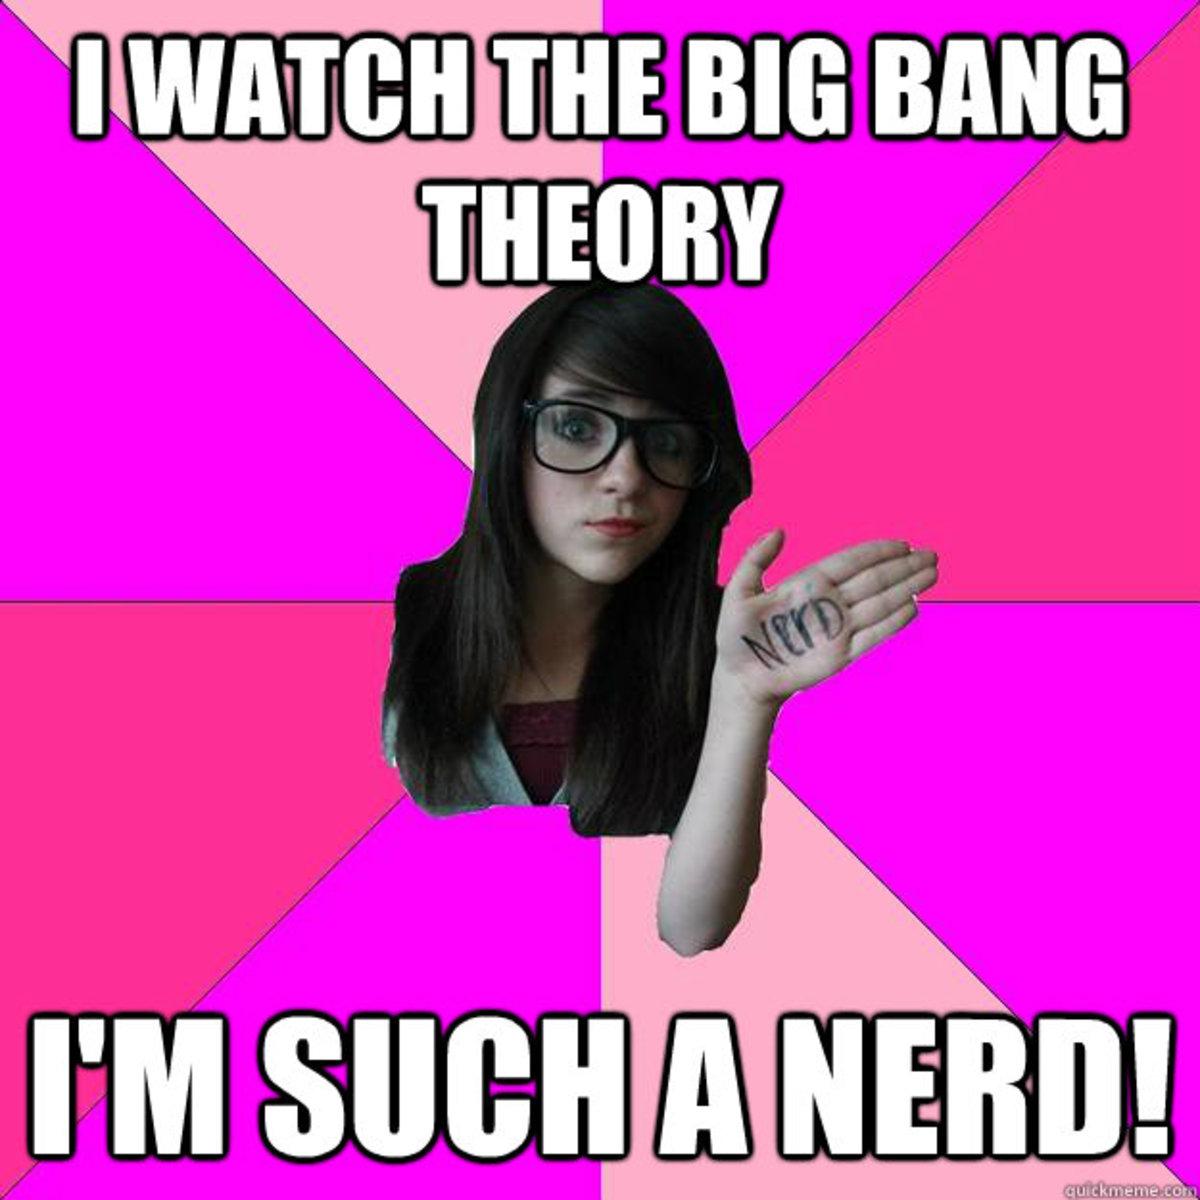 Big Bang Theory VS. Community: Transferring to Greendale